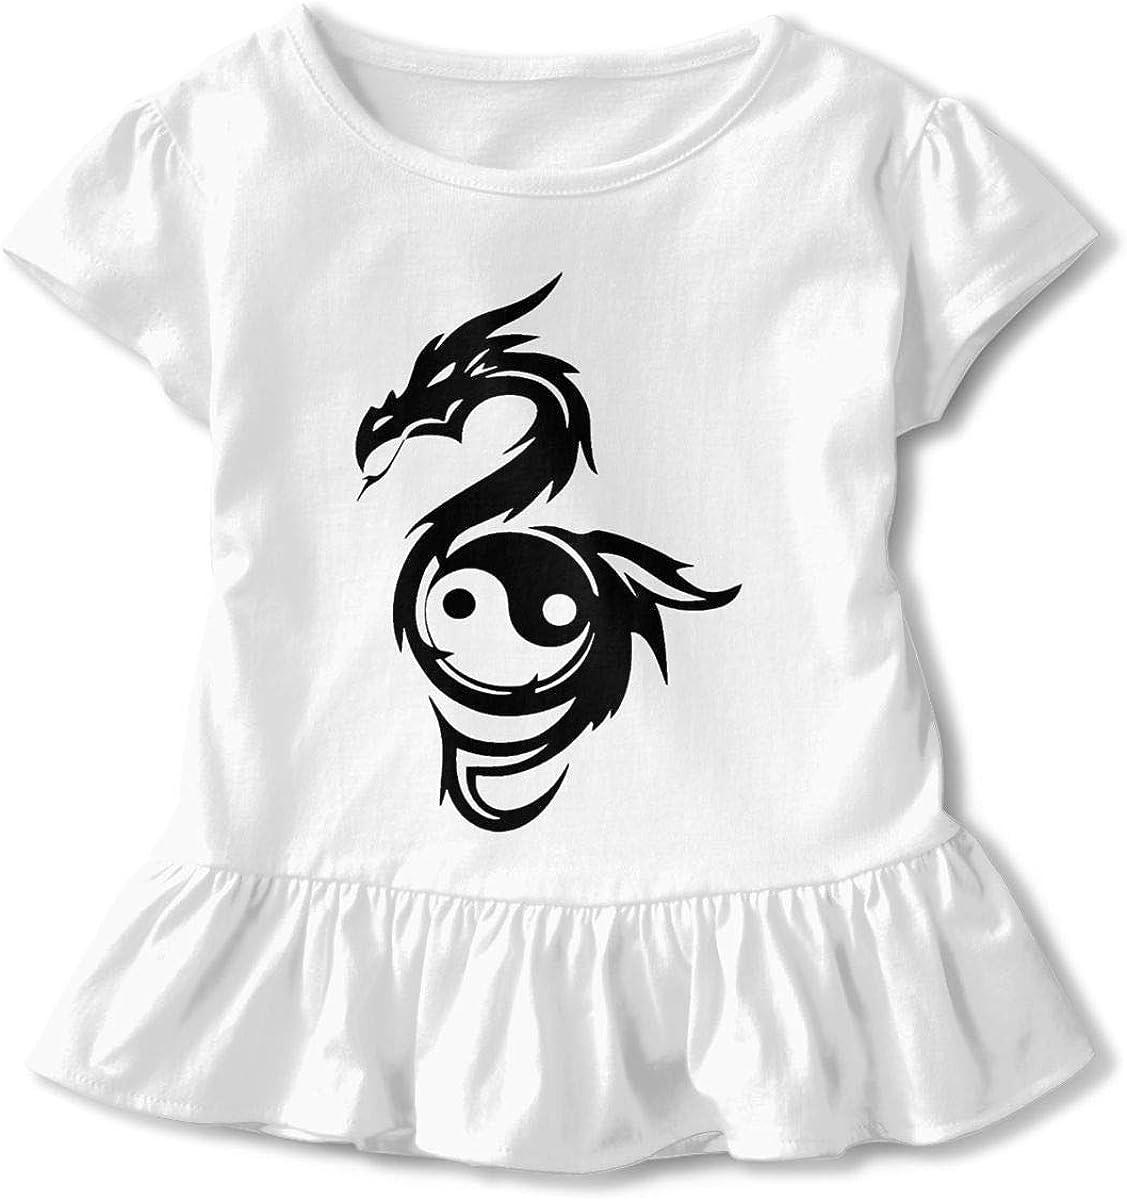 Yin Yang Dragon Shirt Baby Girls Ruffles O-Neck Basic Shirt for 2-6 Years Old Baby